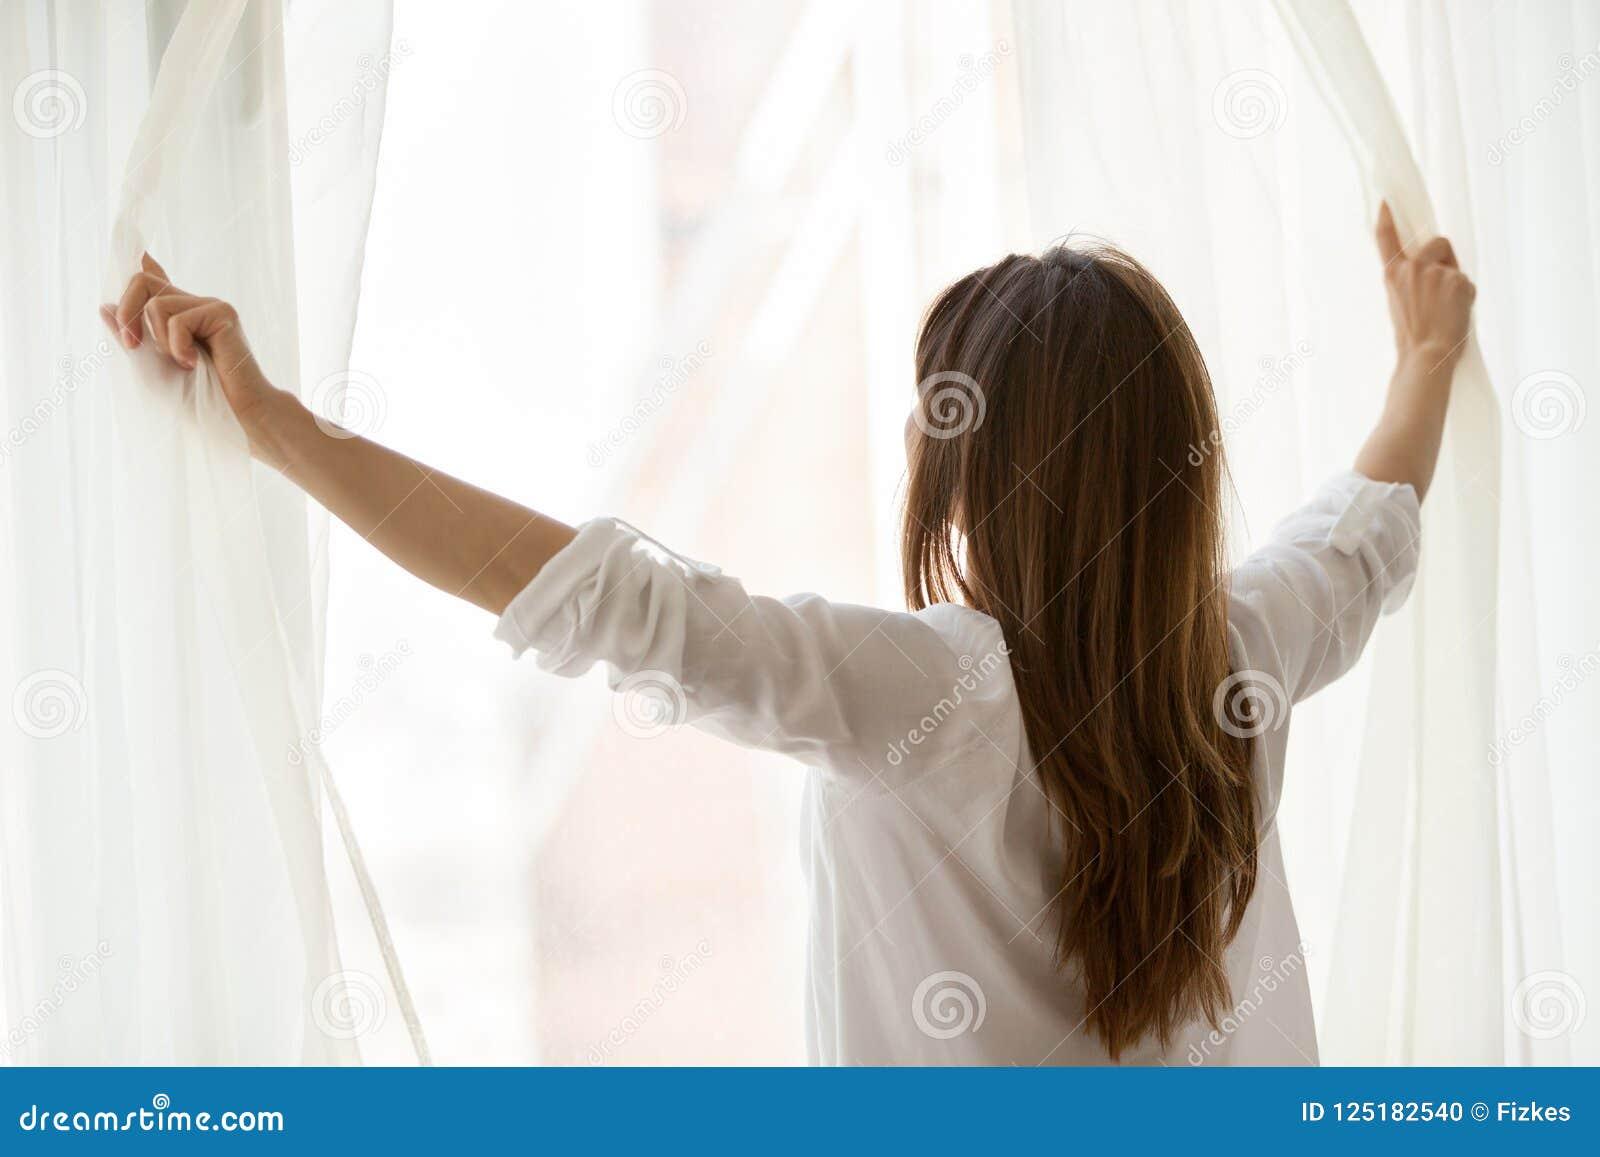 Rear view at woman opening window curtains enjoying good morning